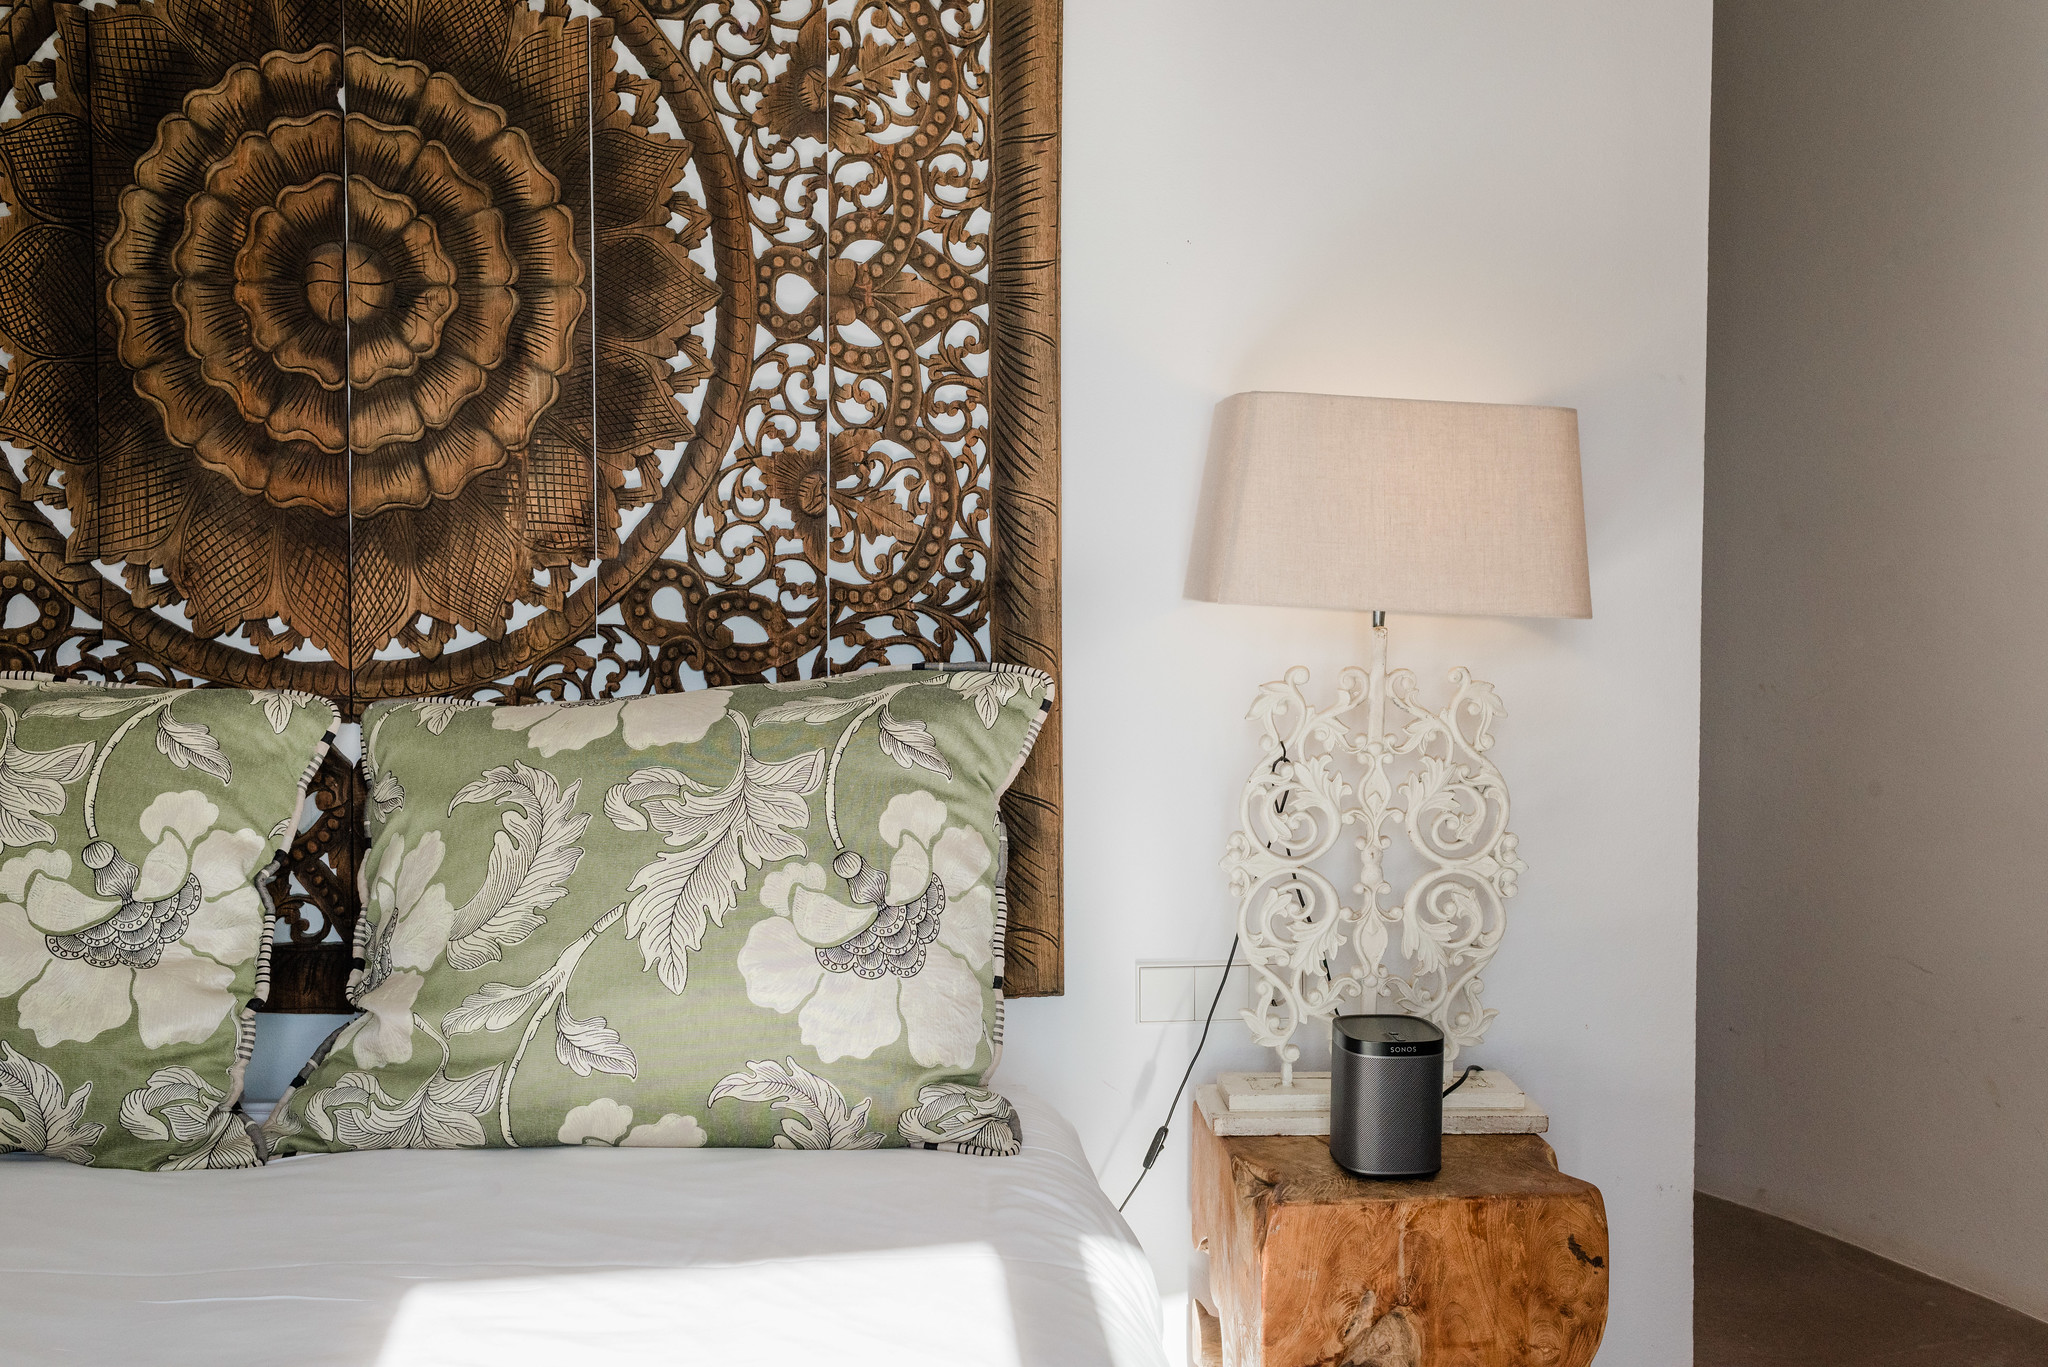 https://www.white-ibiza.com/wp-content/uploads/2020/05/white-ibiza-villas-casa-amalia-interior-bedroom5.jpg